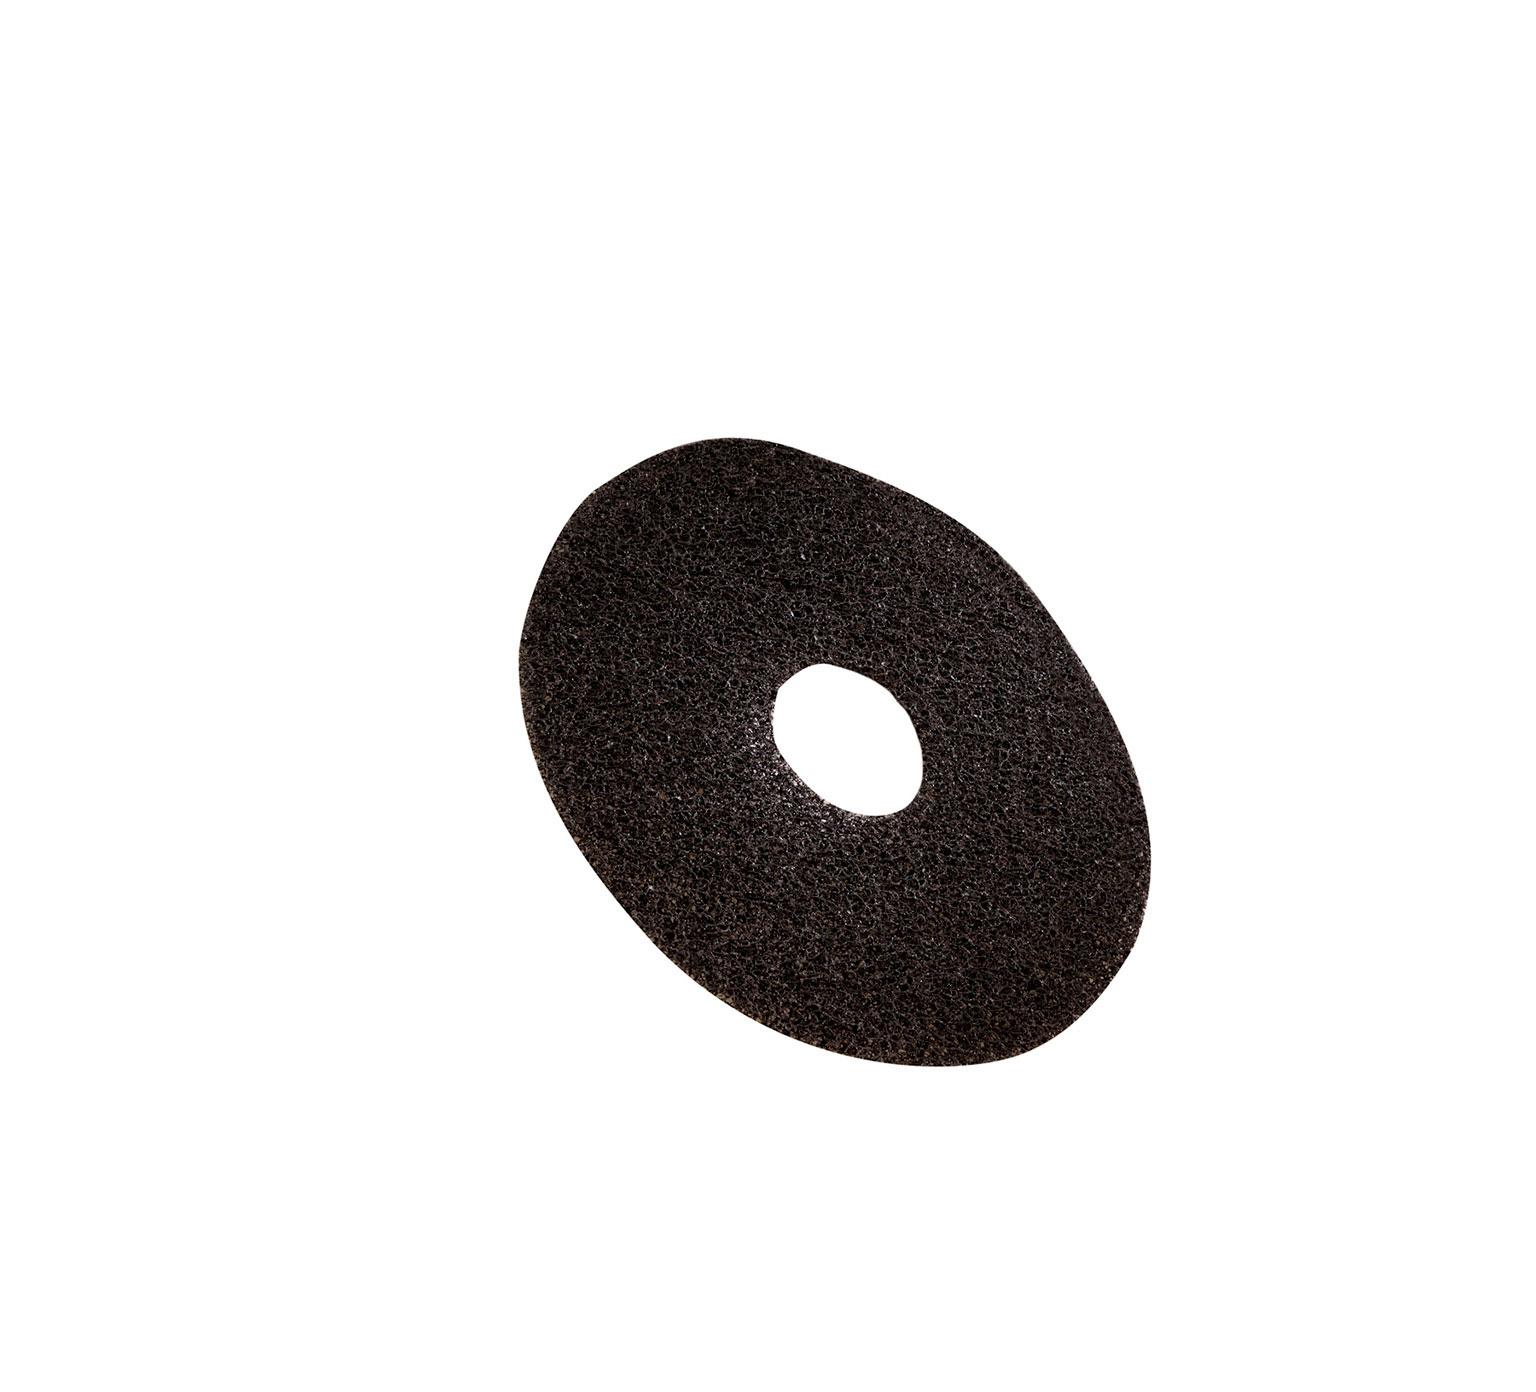 3m Black Stripping Pad 14 In 356 Mm 370091